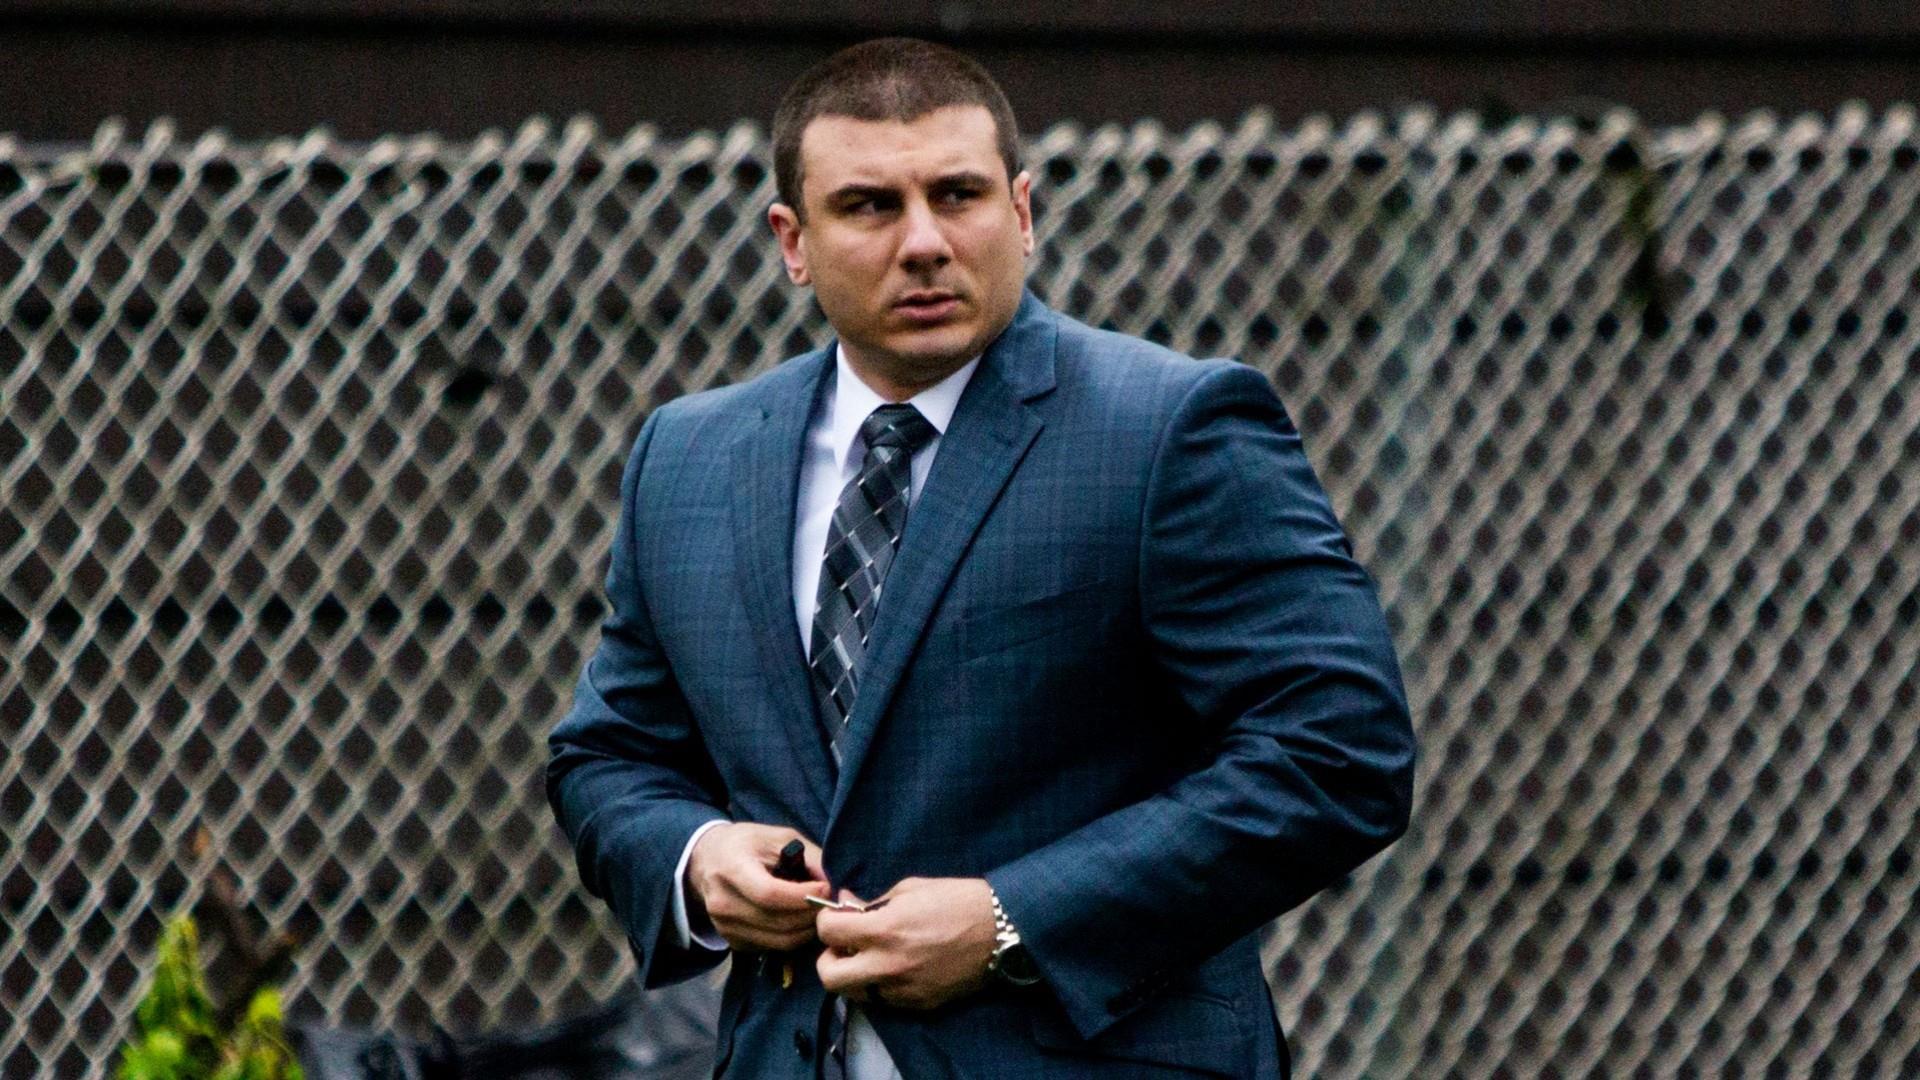 NYPD fires Officer Daniel Pantaleo for chokehold in Eric Garner's death